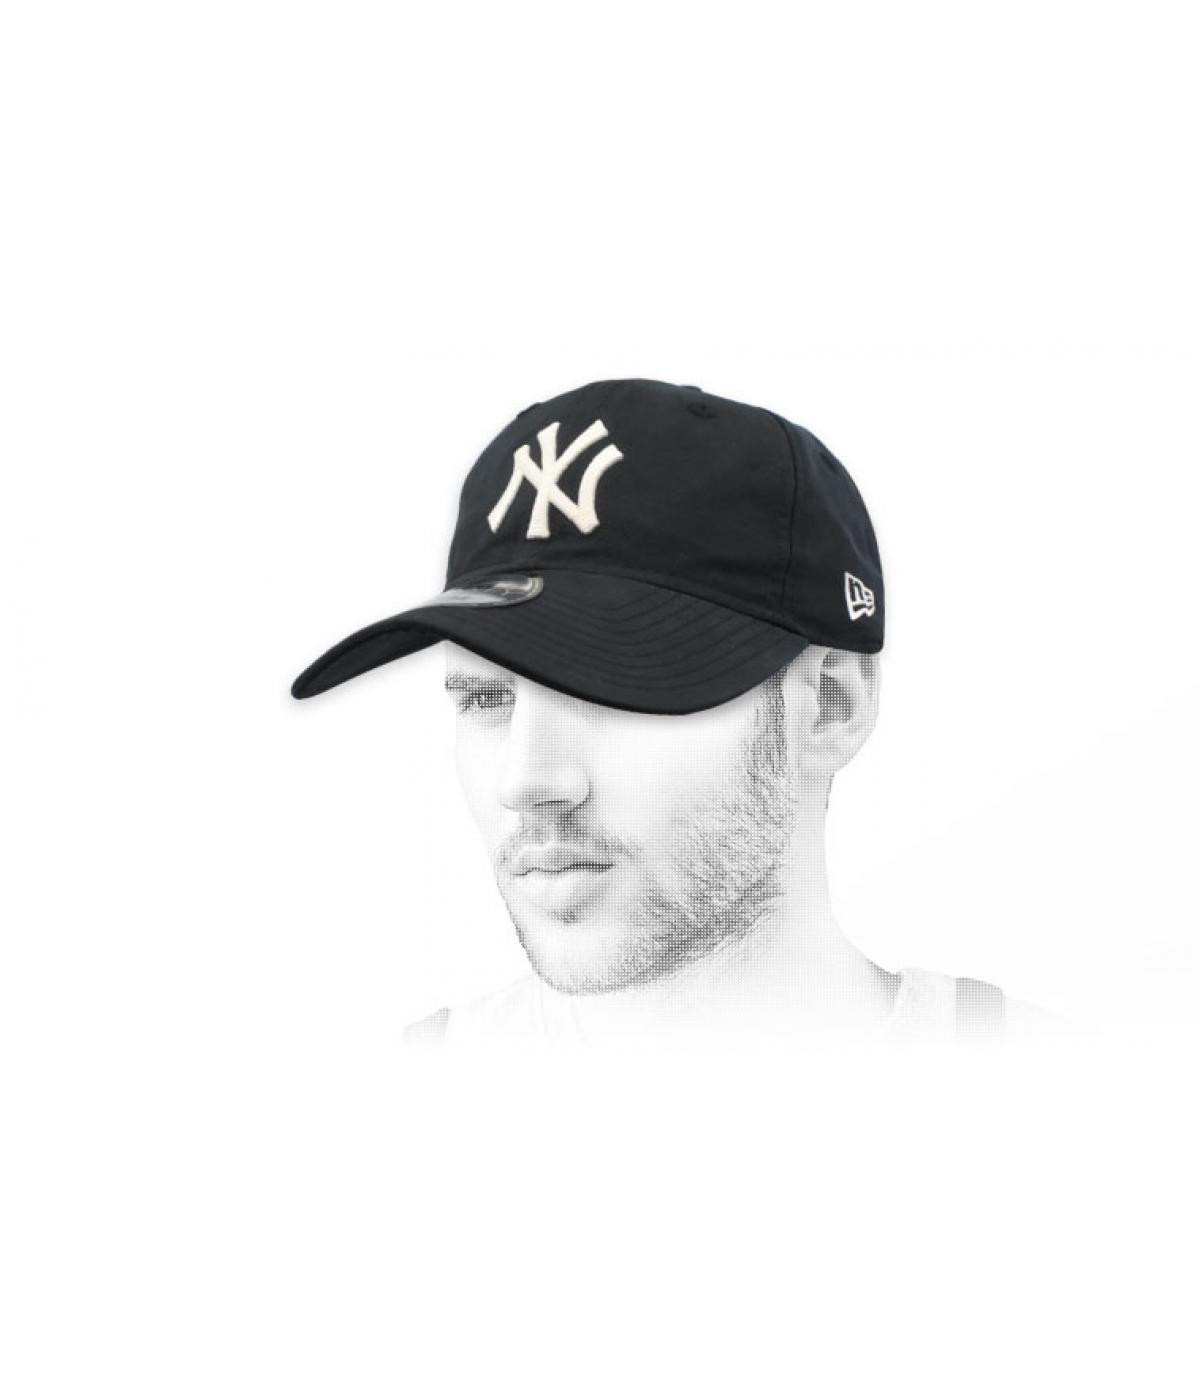 Cap NY klappbar schwarz